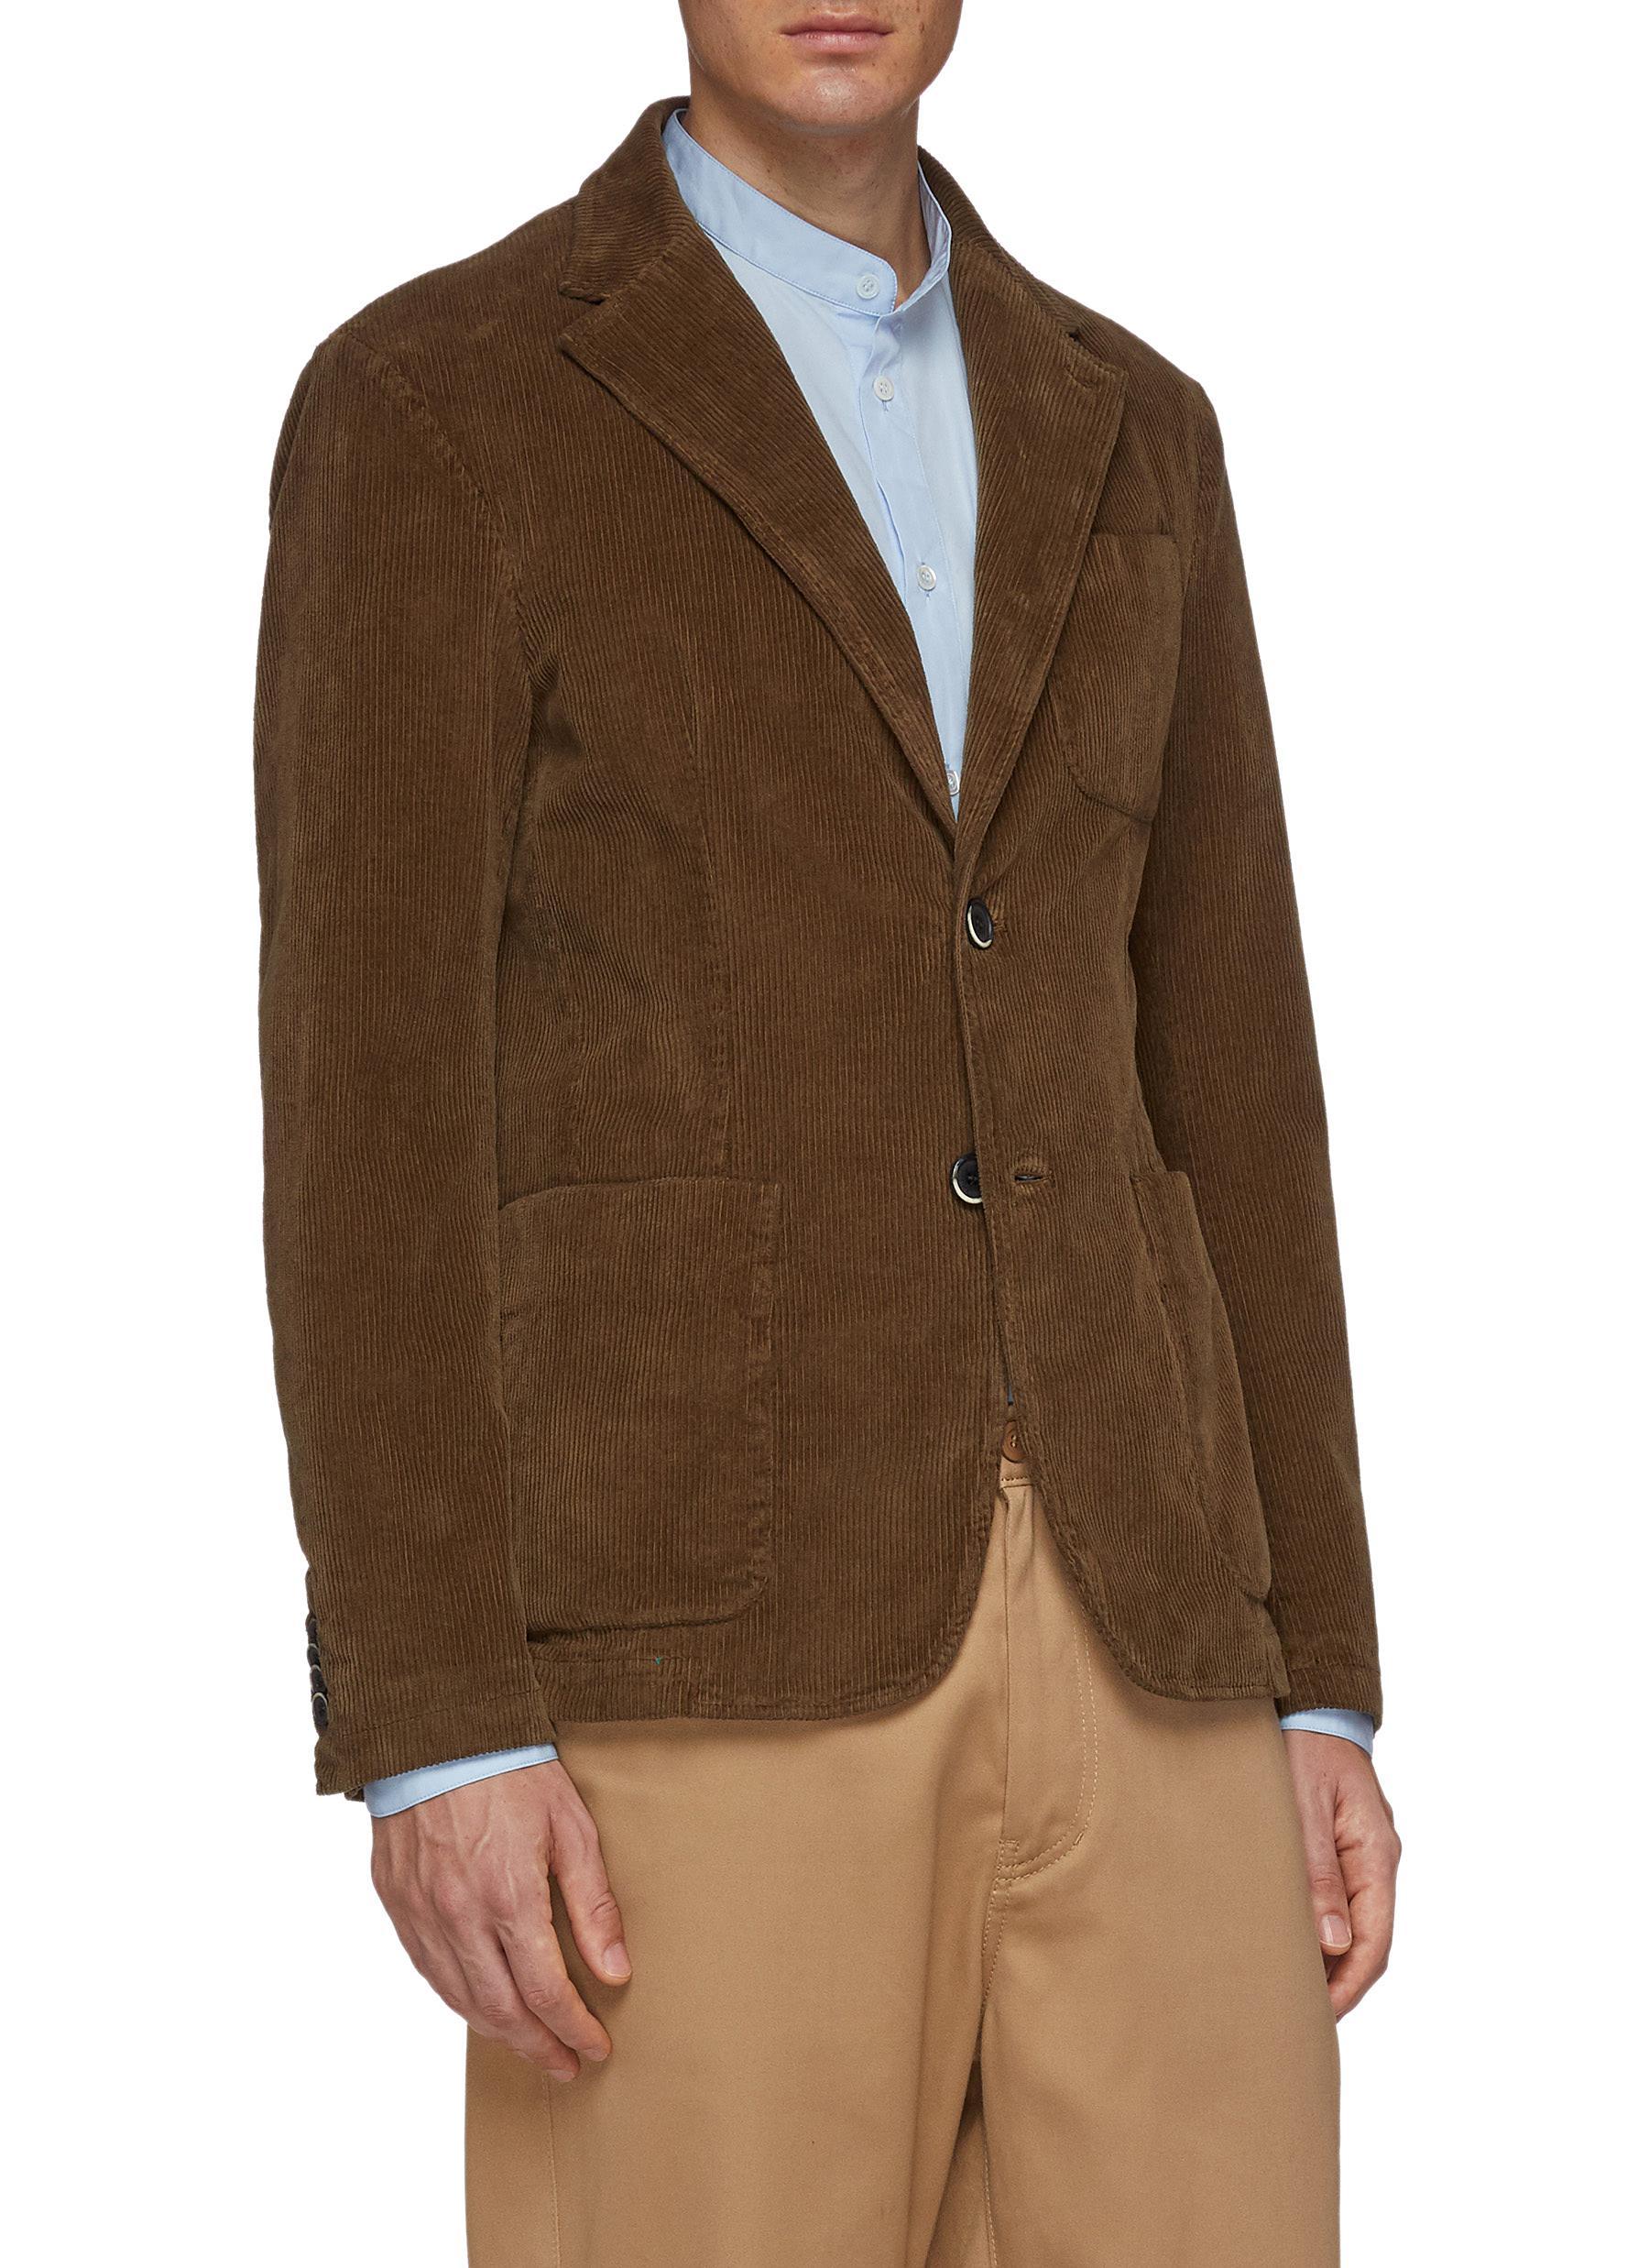 △ Barena Corduroy Soft Blazer  US$565 (~HK$4,419)